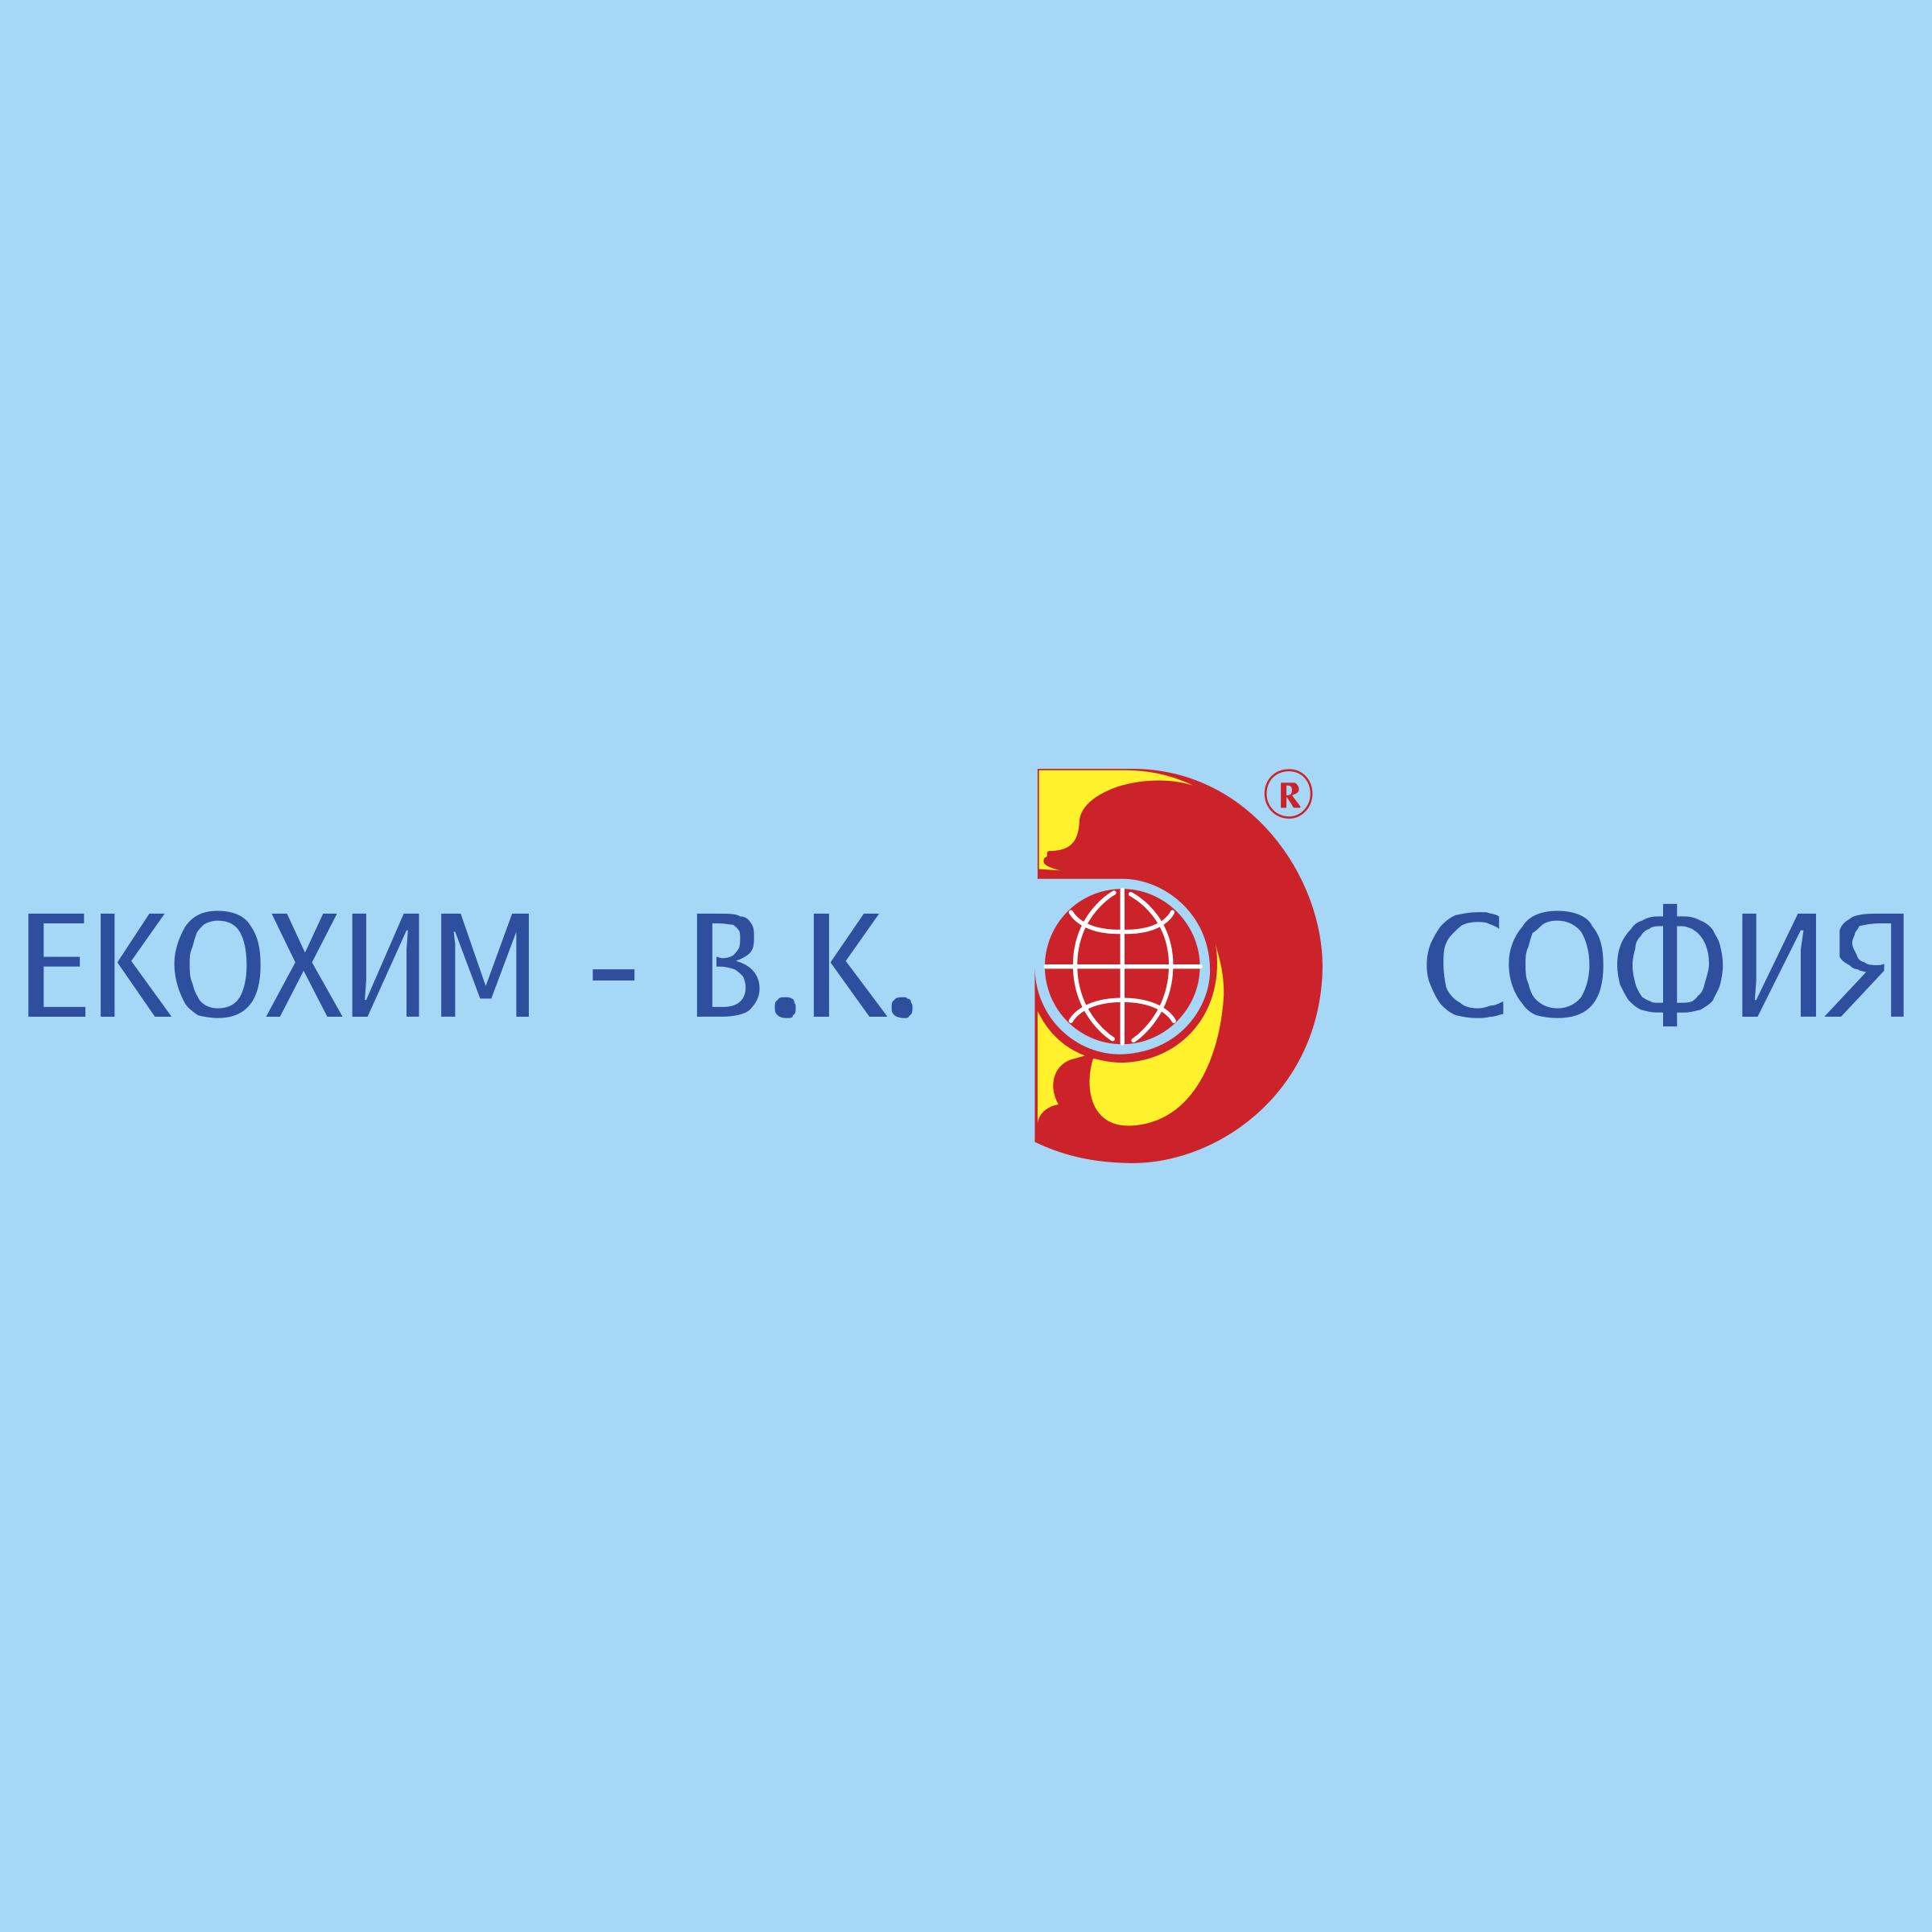 Ecohim vk logo png transparent svg vector freebie supply ecohim vk logo png transparent toneelgroepblik Gallery